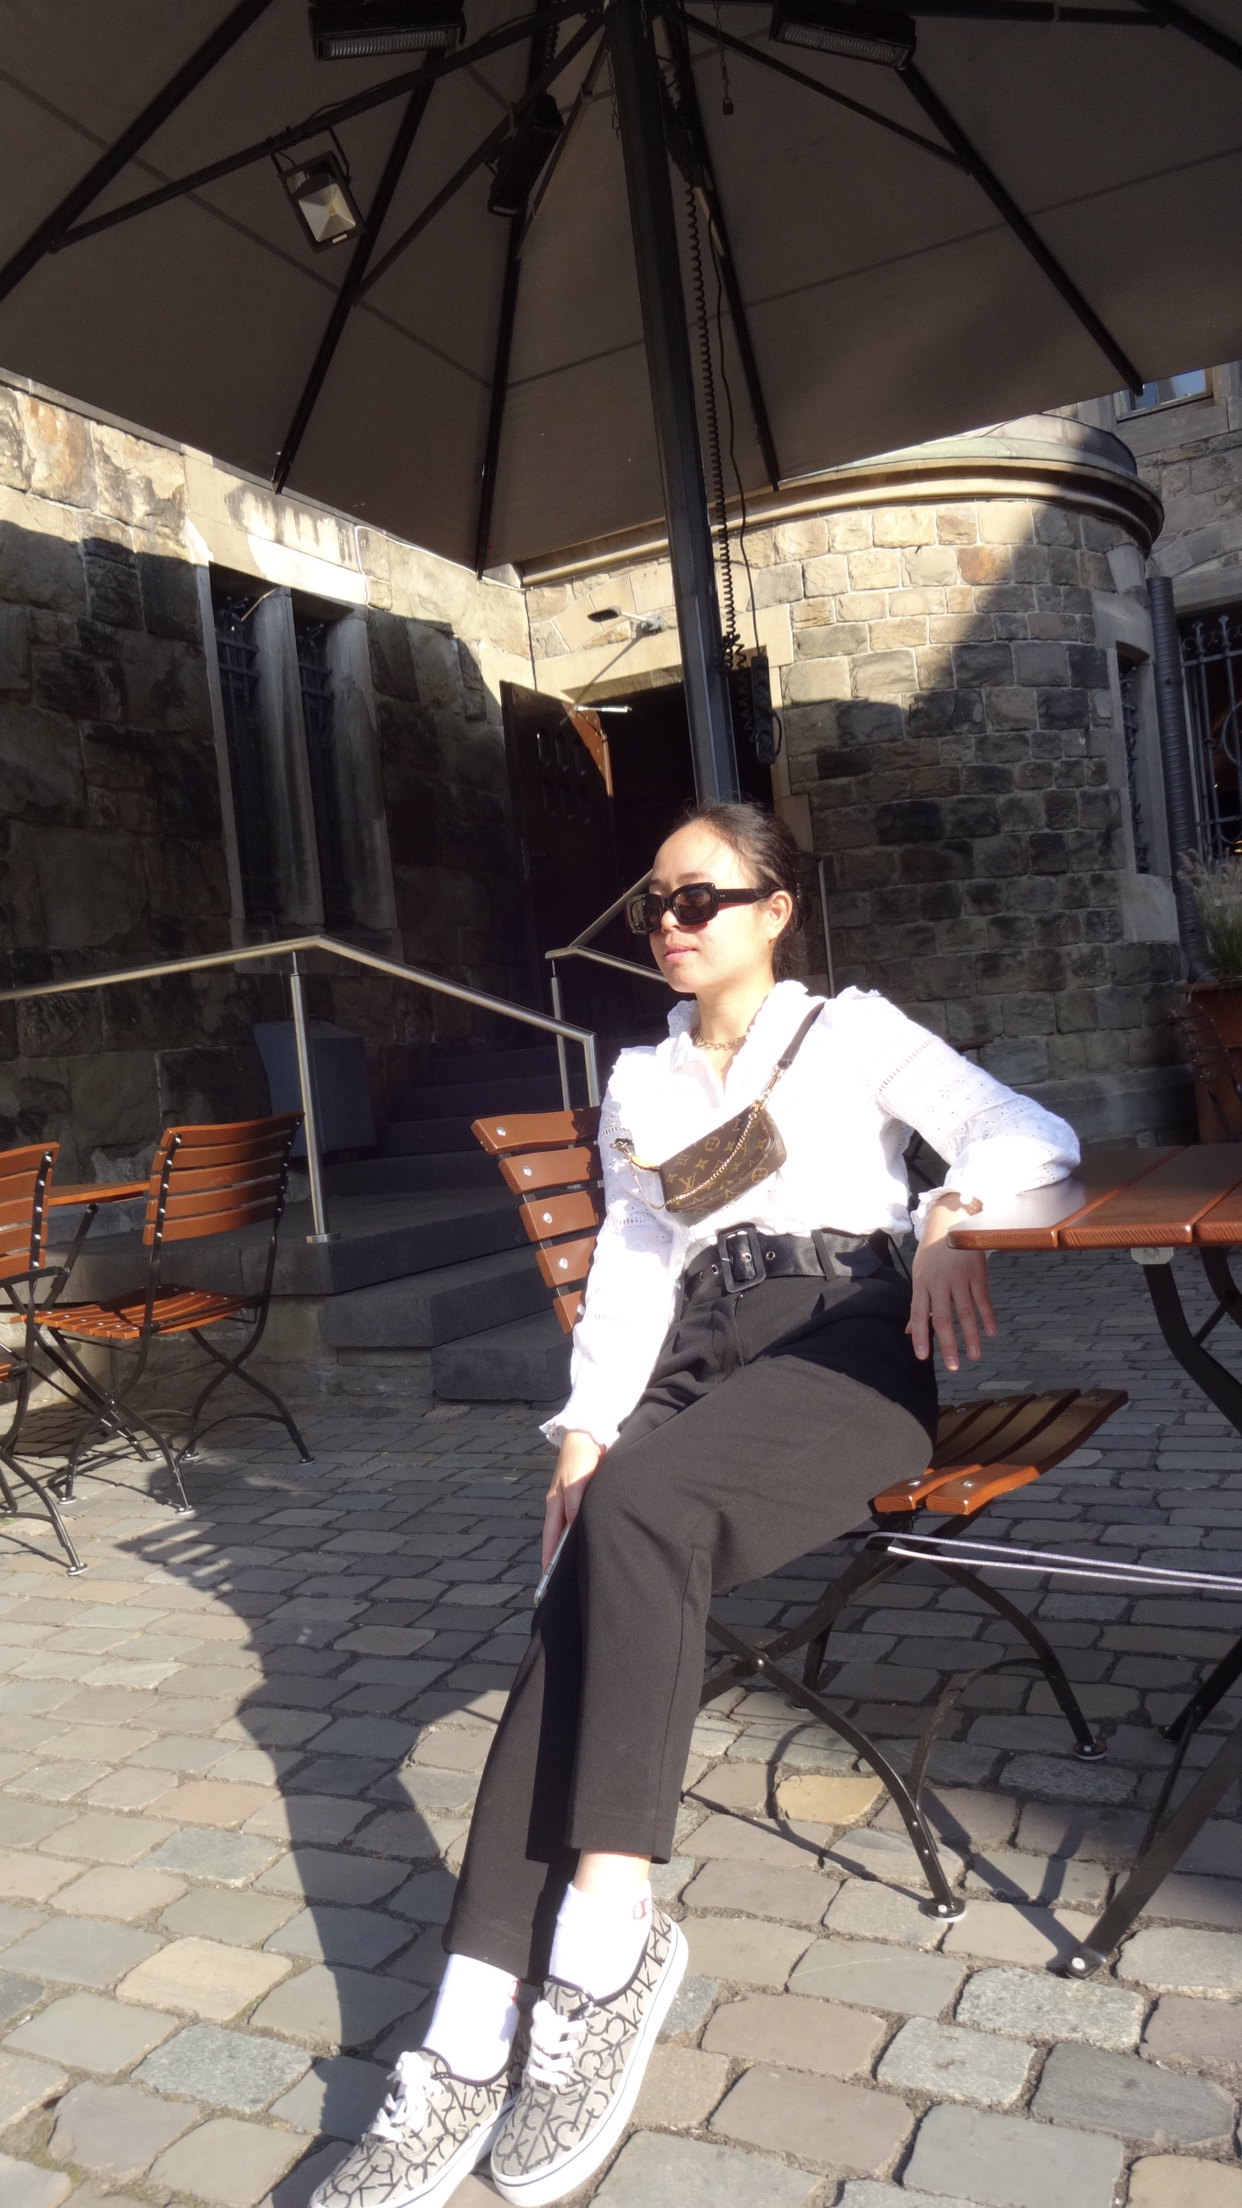 Louis Vuitton mini pochette review, How to Wear Louis Vuitton Mini Pochette 3 Different Ways, louis vuitton wristlet strap, louis vuitton pochette crossbody strap, louis vuitton mini pochette in damier azur,mini pochette availability,mini pochette crossbody,louis vuitton pochette crossbody strap,louis vuitton gold chain strap,louis vuitton pochette, louis vuitton pochette metis,